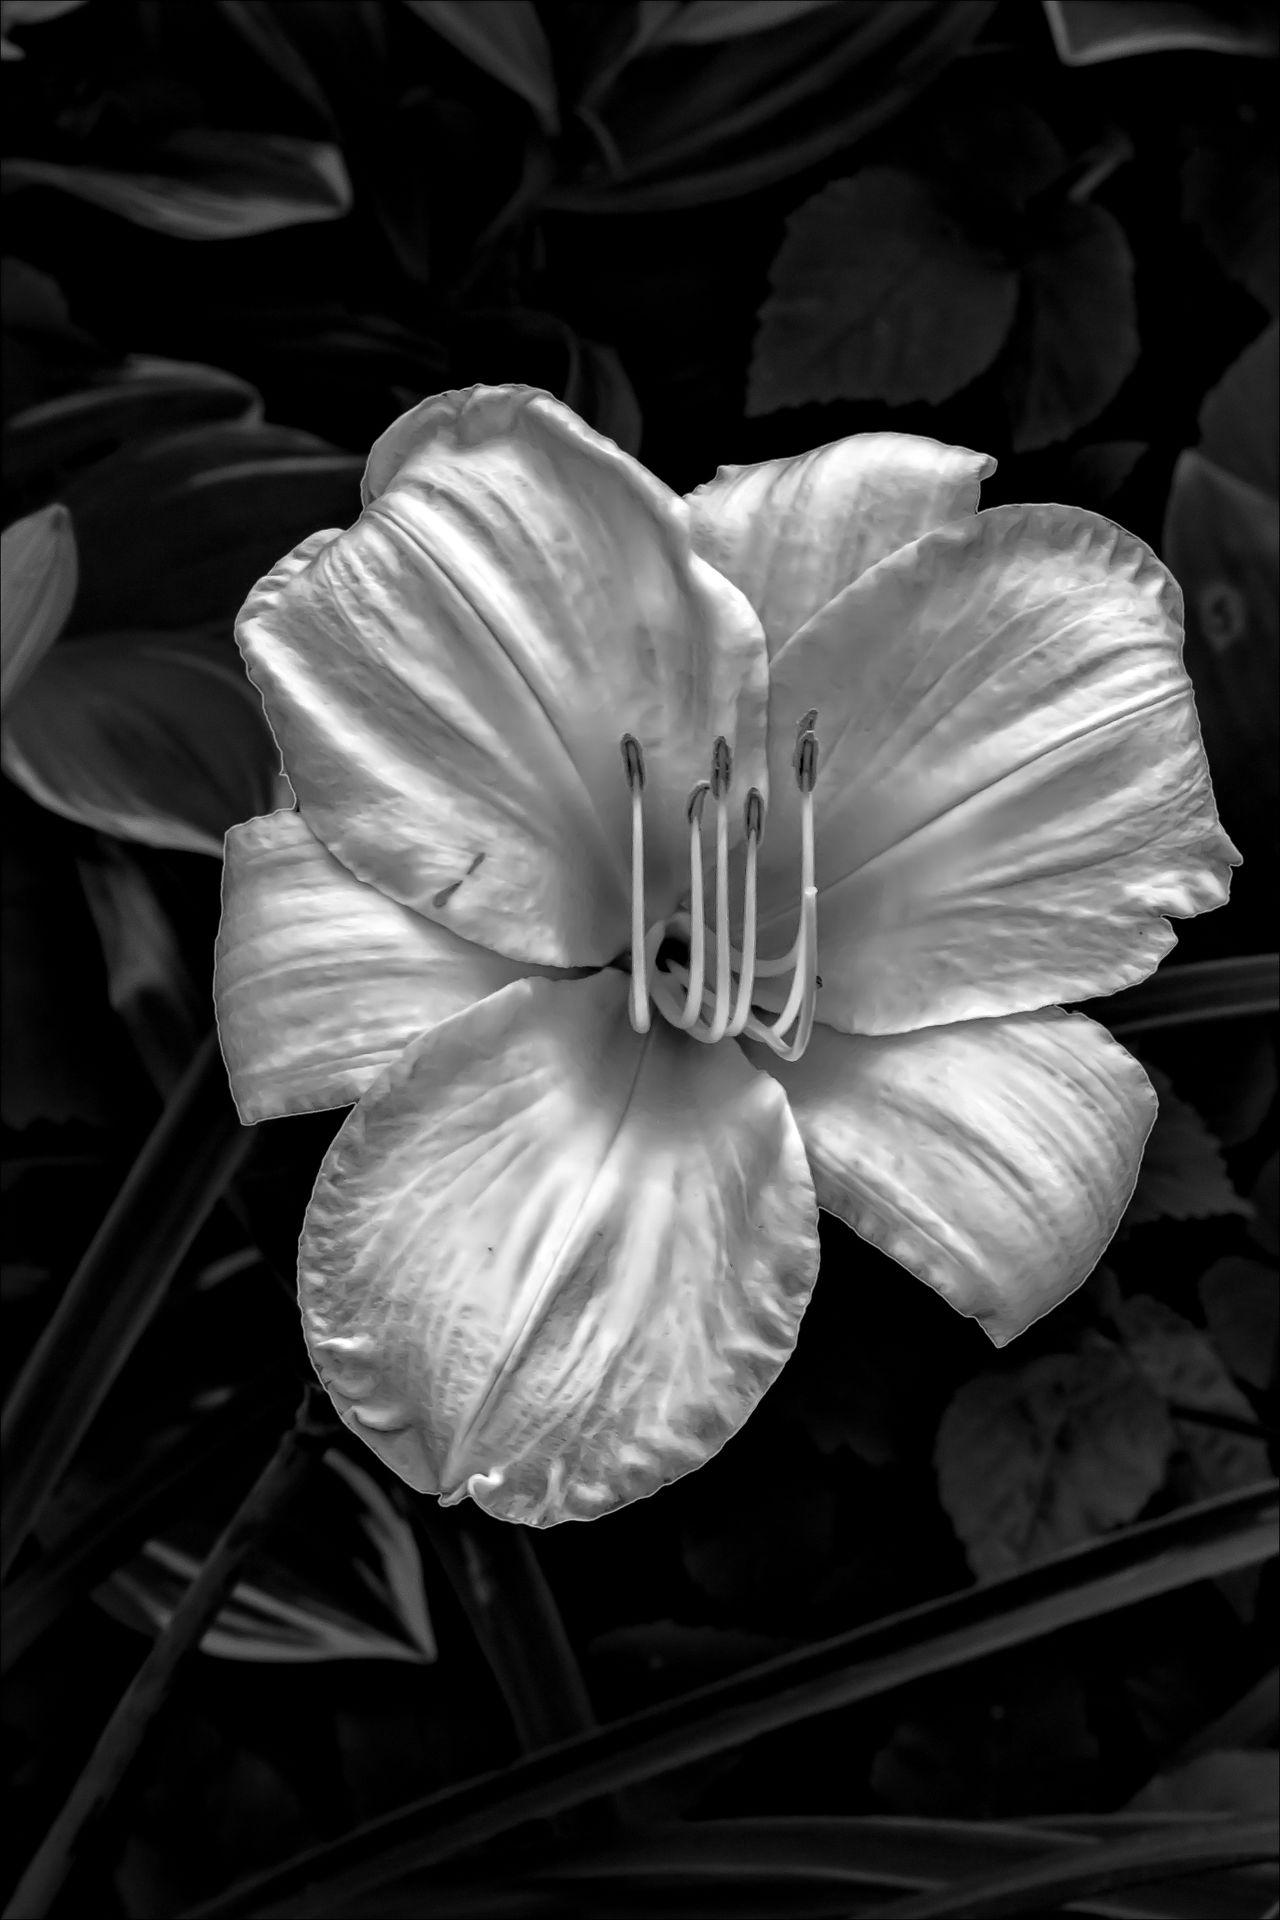 black and white lily Black And White Black And White Lily Flower Flower Still Life Lily Lily Still Life Nature Nature Still Life